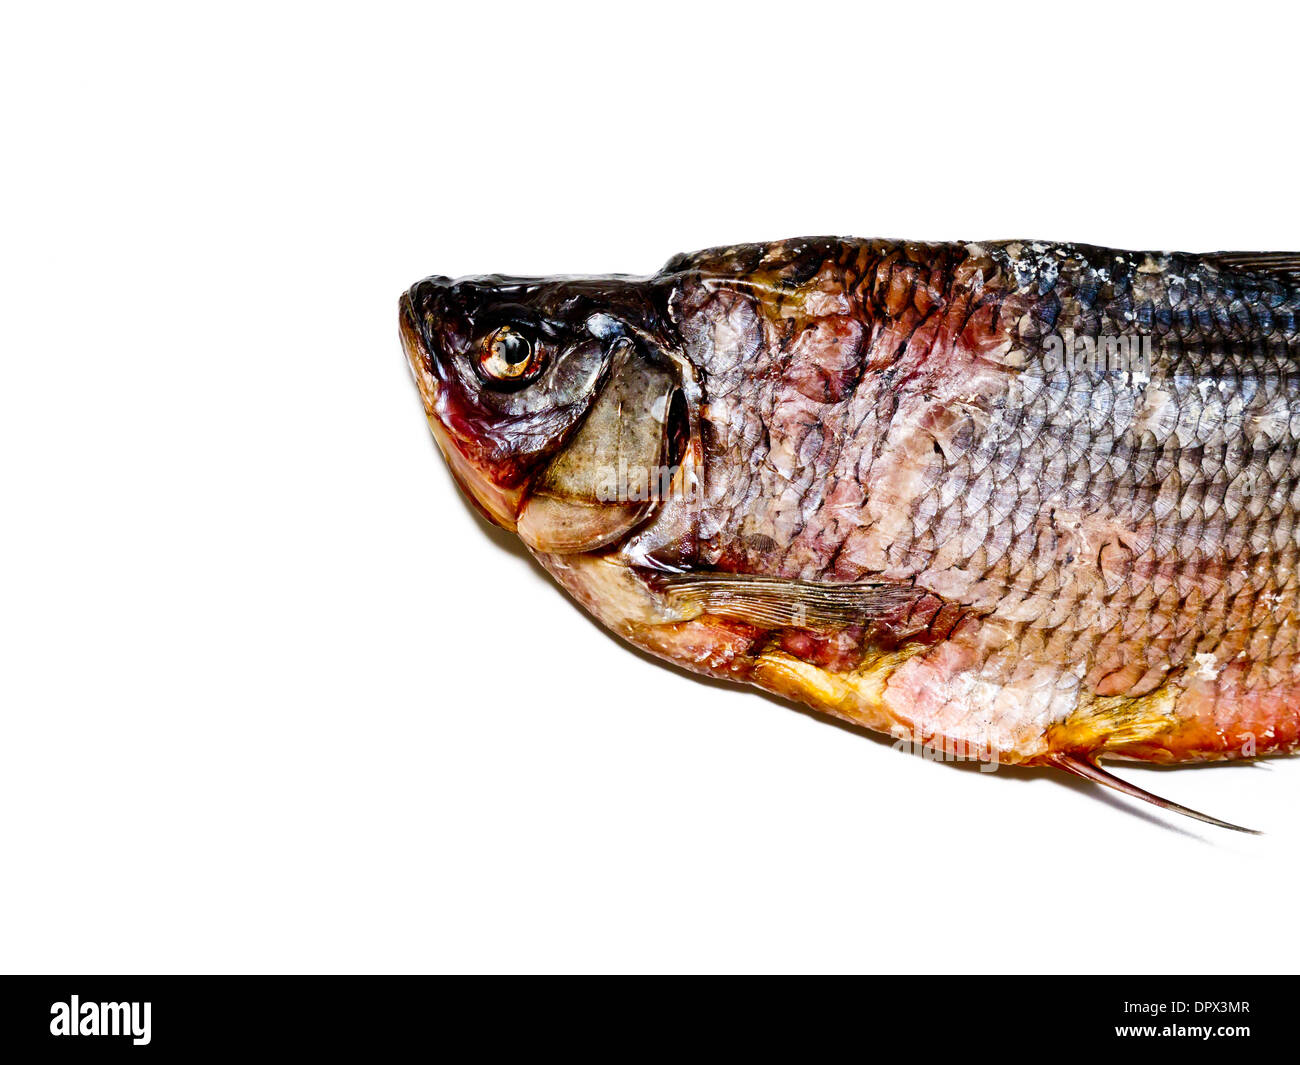 Dried fish. - Stock Image